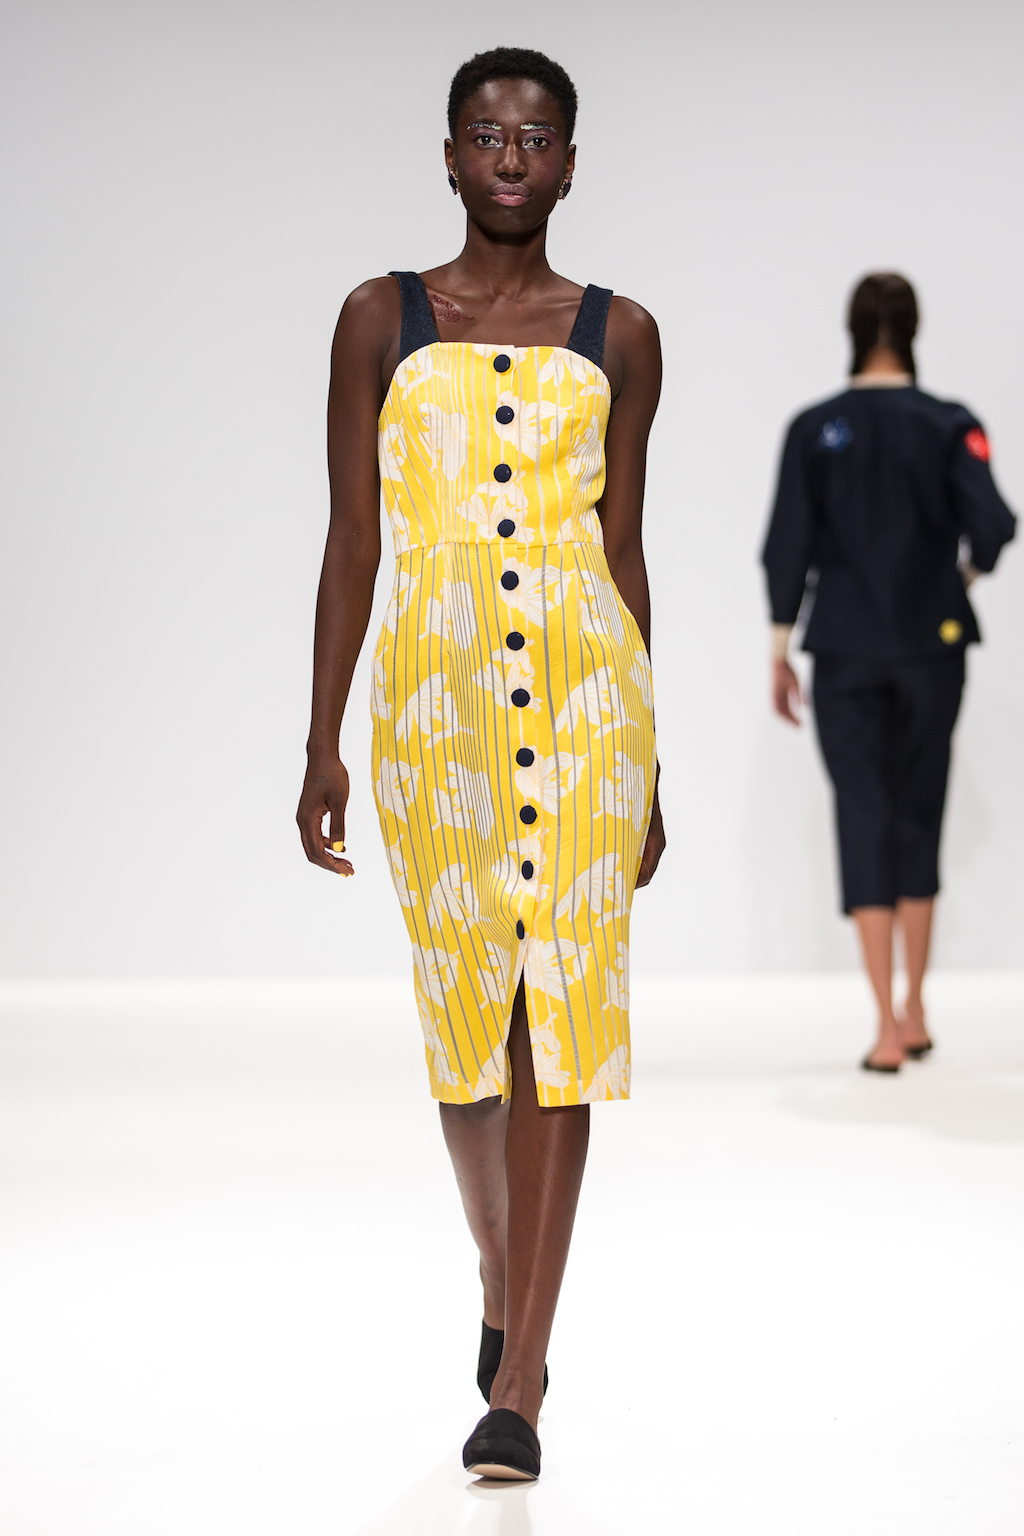 London Fashion Week Spring Summer 2017 - Sabinna